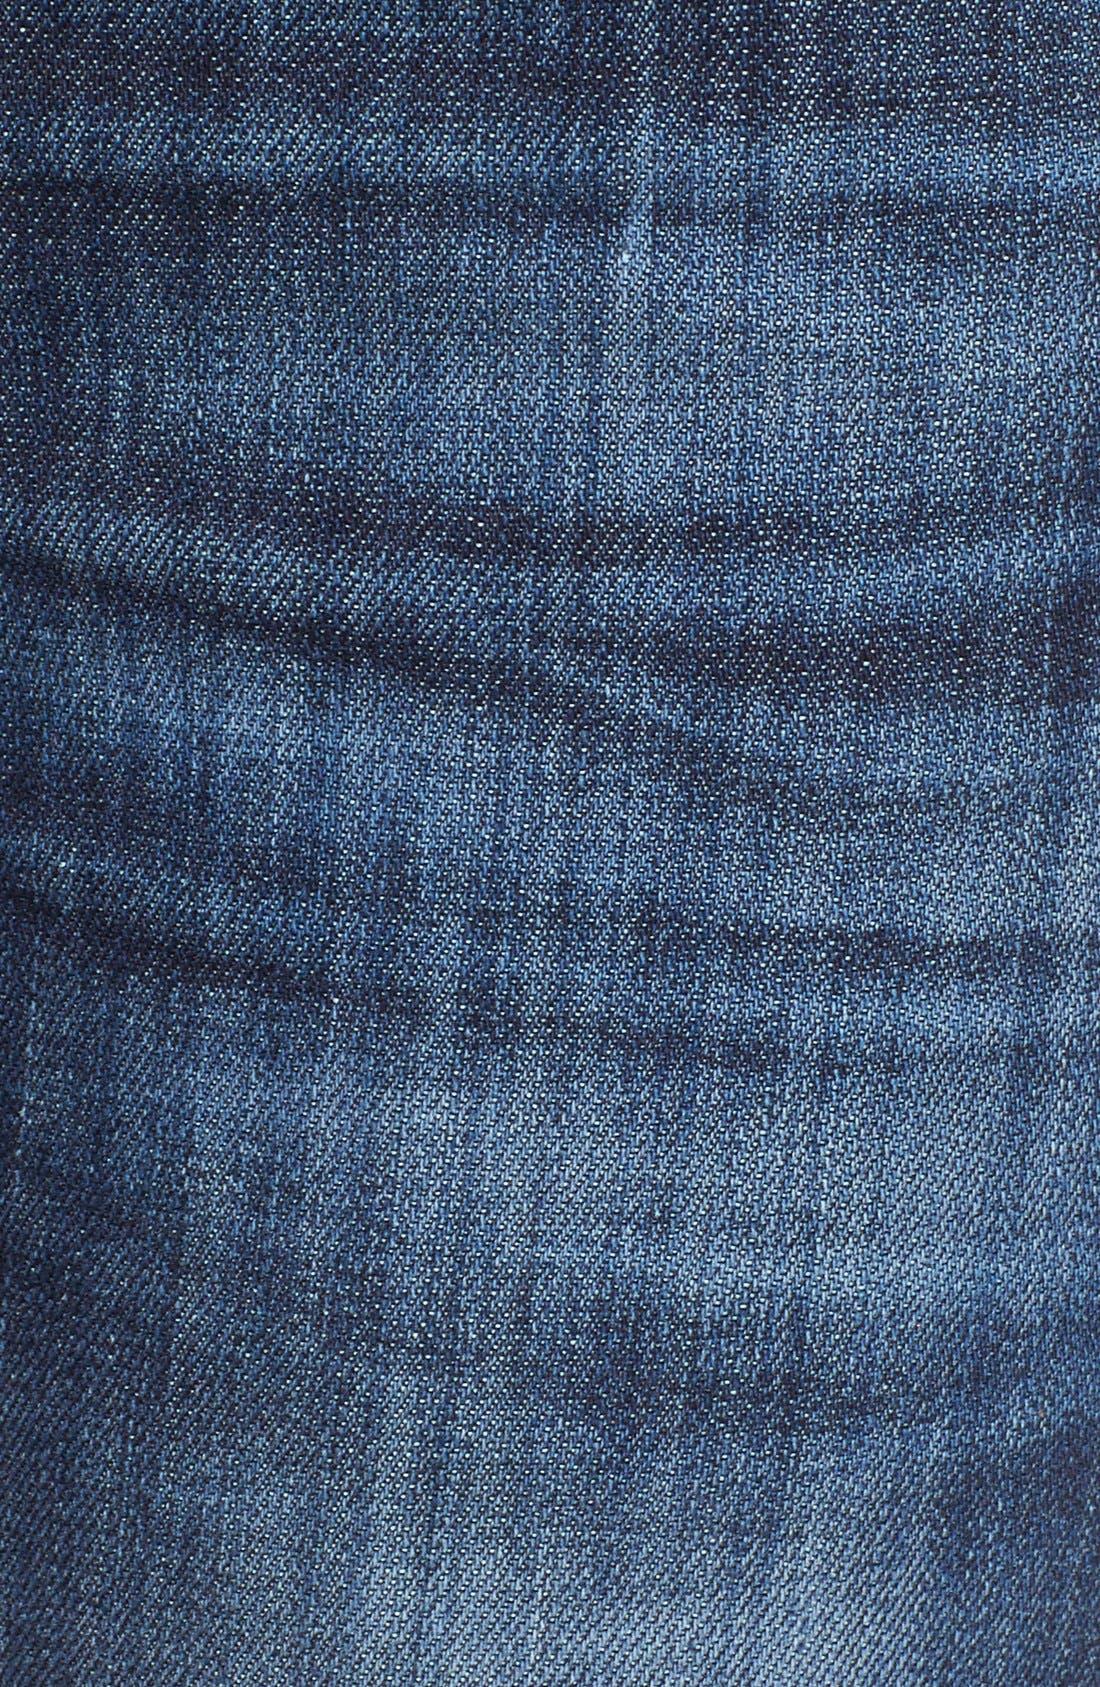 'Catherine' Stretch Boyfriend Jeans,                             Alternate thumbnail 5, color,                             402